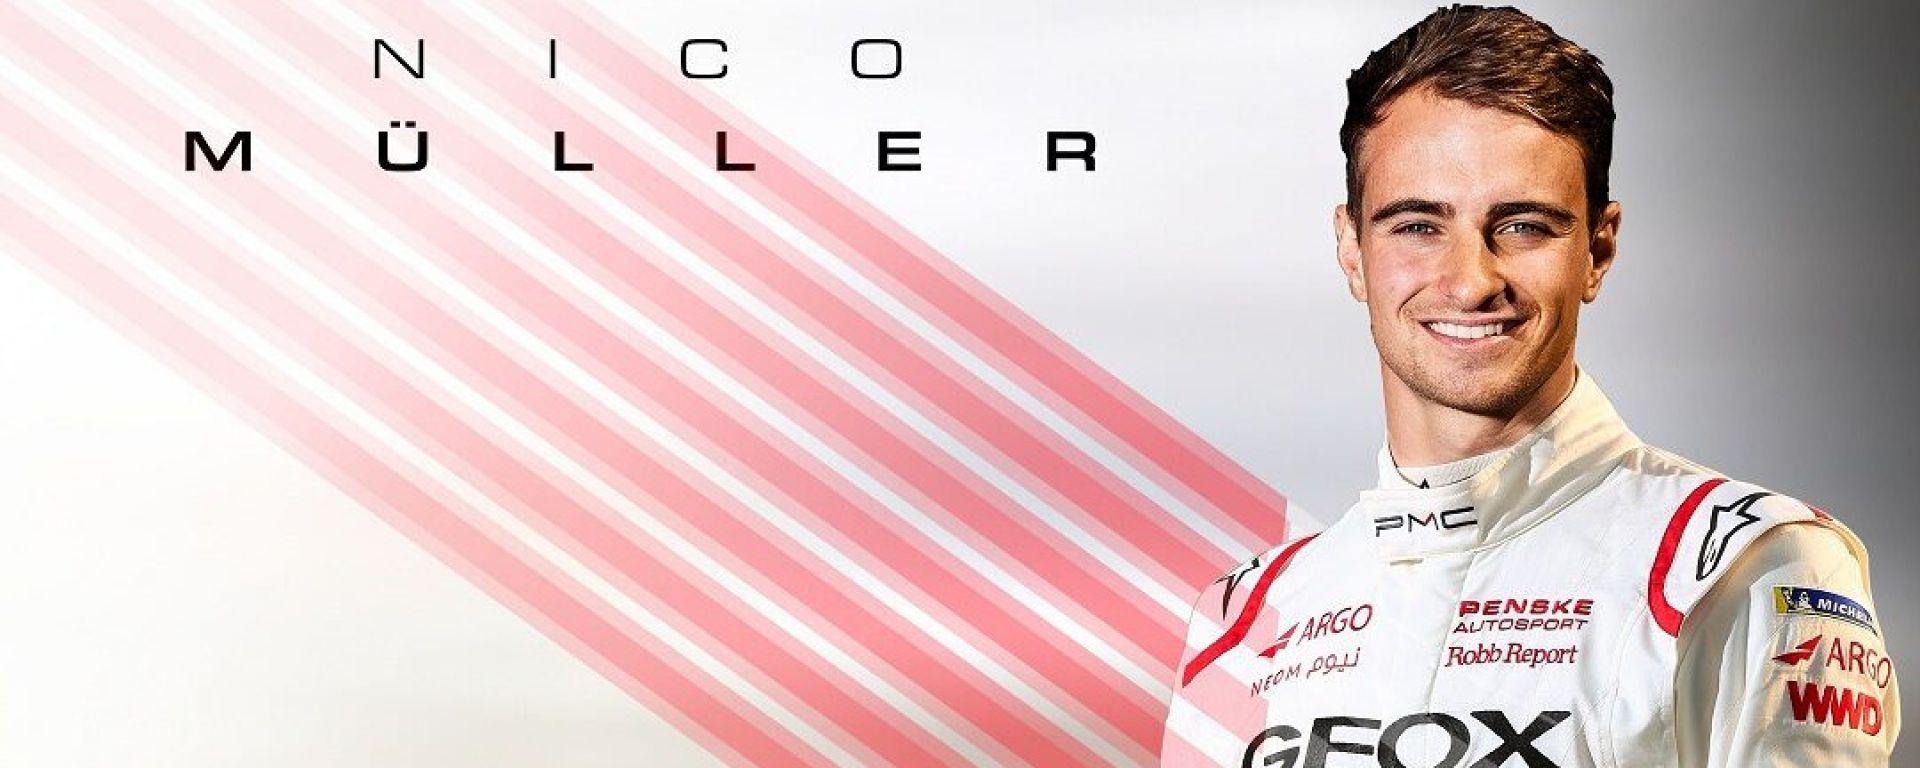 Formula E 2019-2020, Geox Dragon Racing annuncia l'ingaggio di Nico Muller